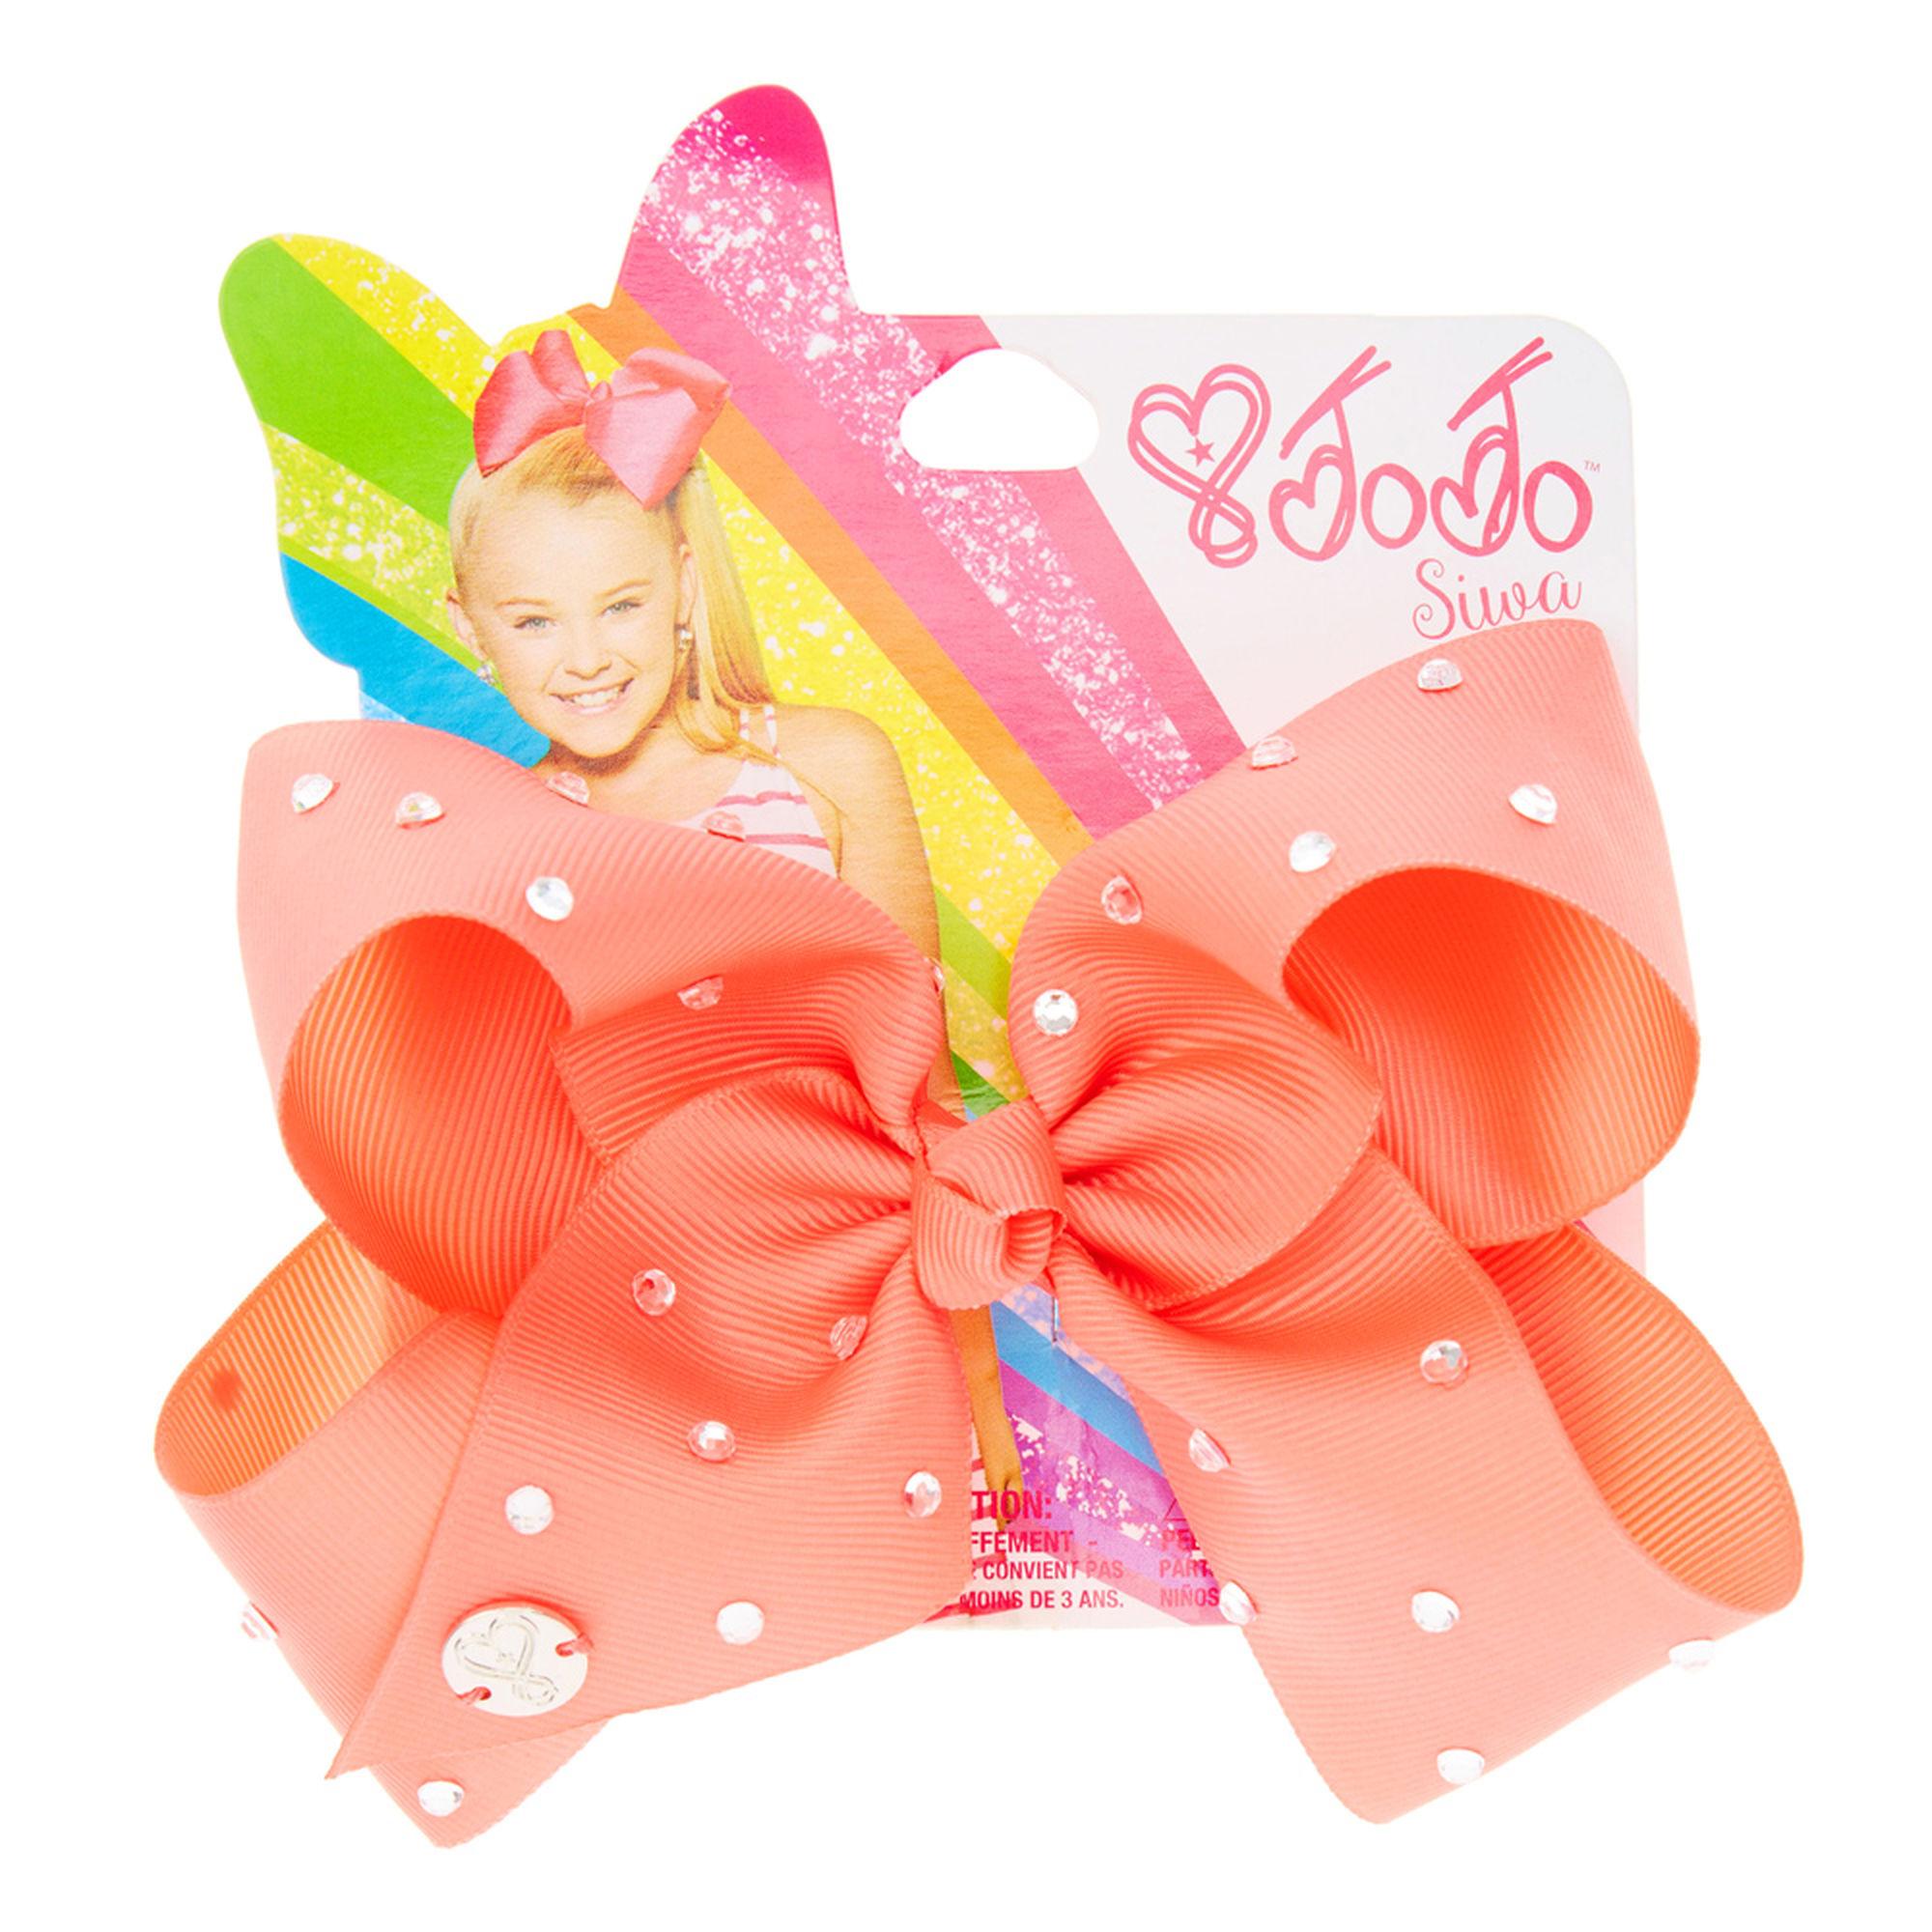 JoJo Siwa Medium Hair Bow (Coral Pink), JoJo Siwa [Designer]